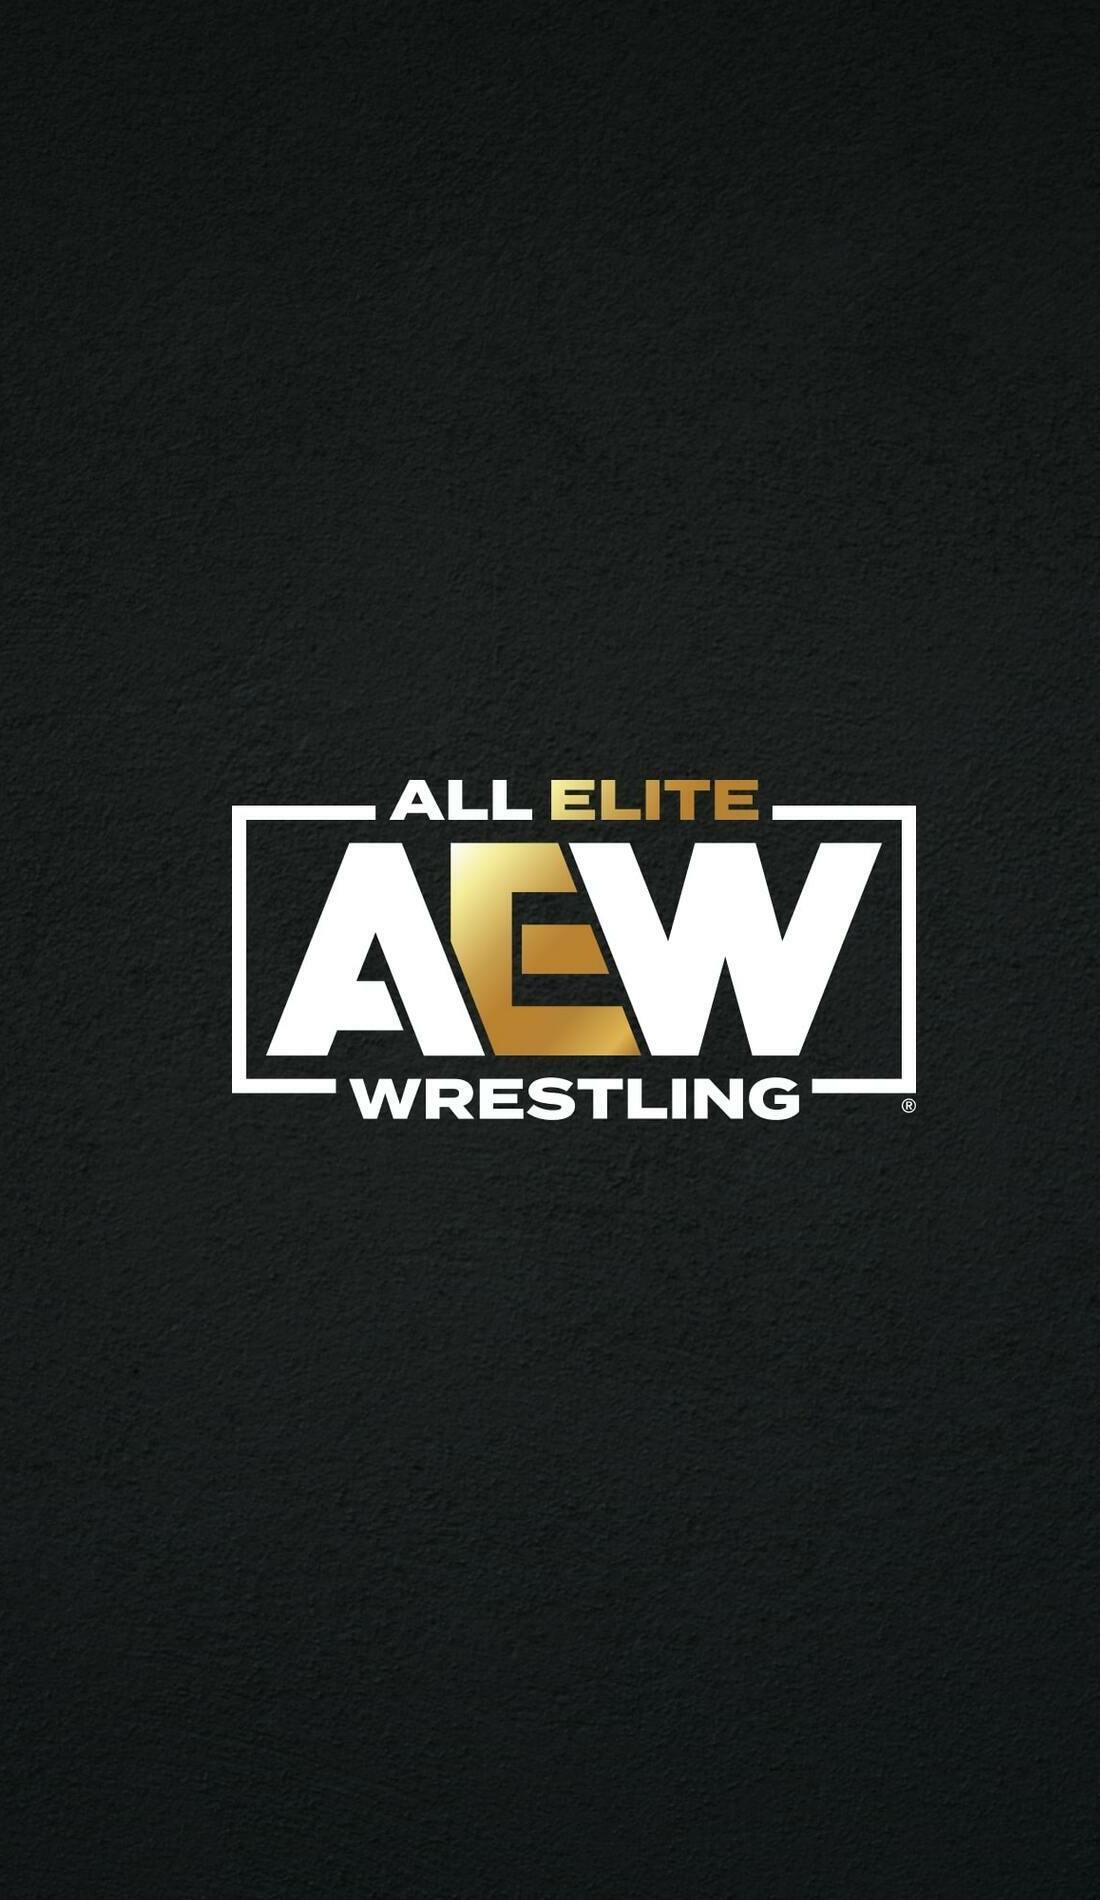 A All Elite Wrestling live event